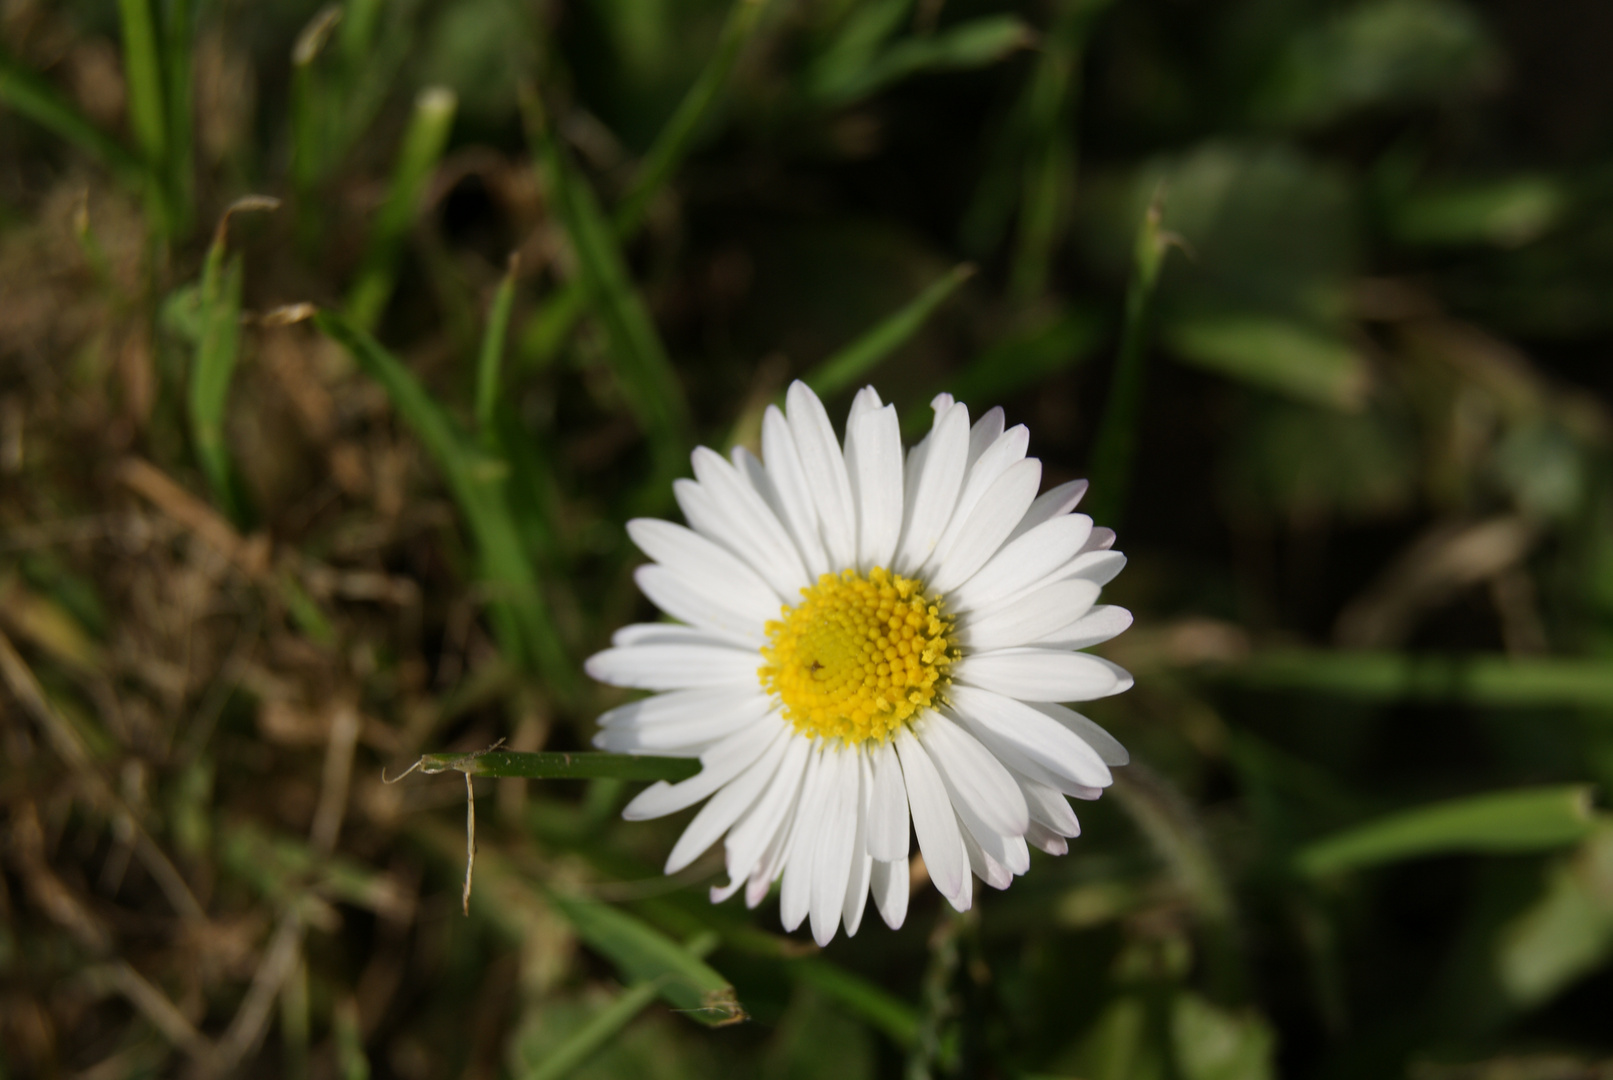 Marguerite - Daisy